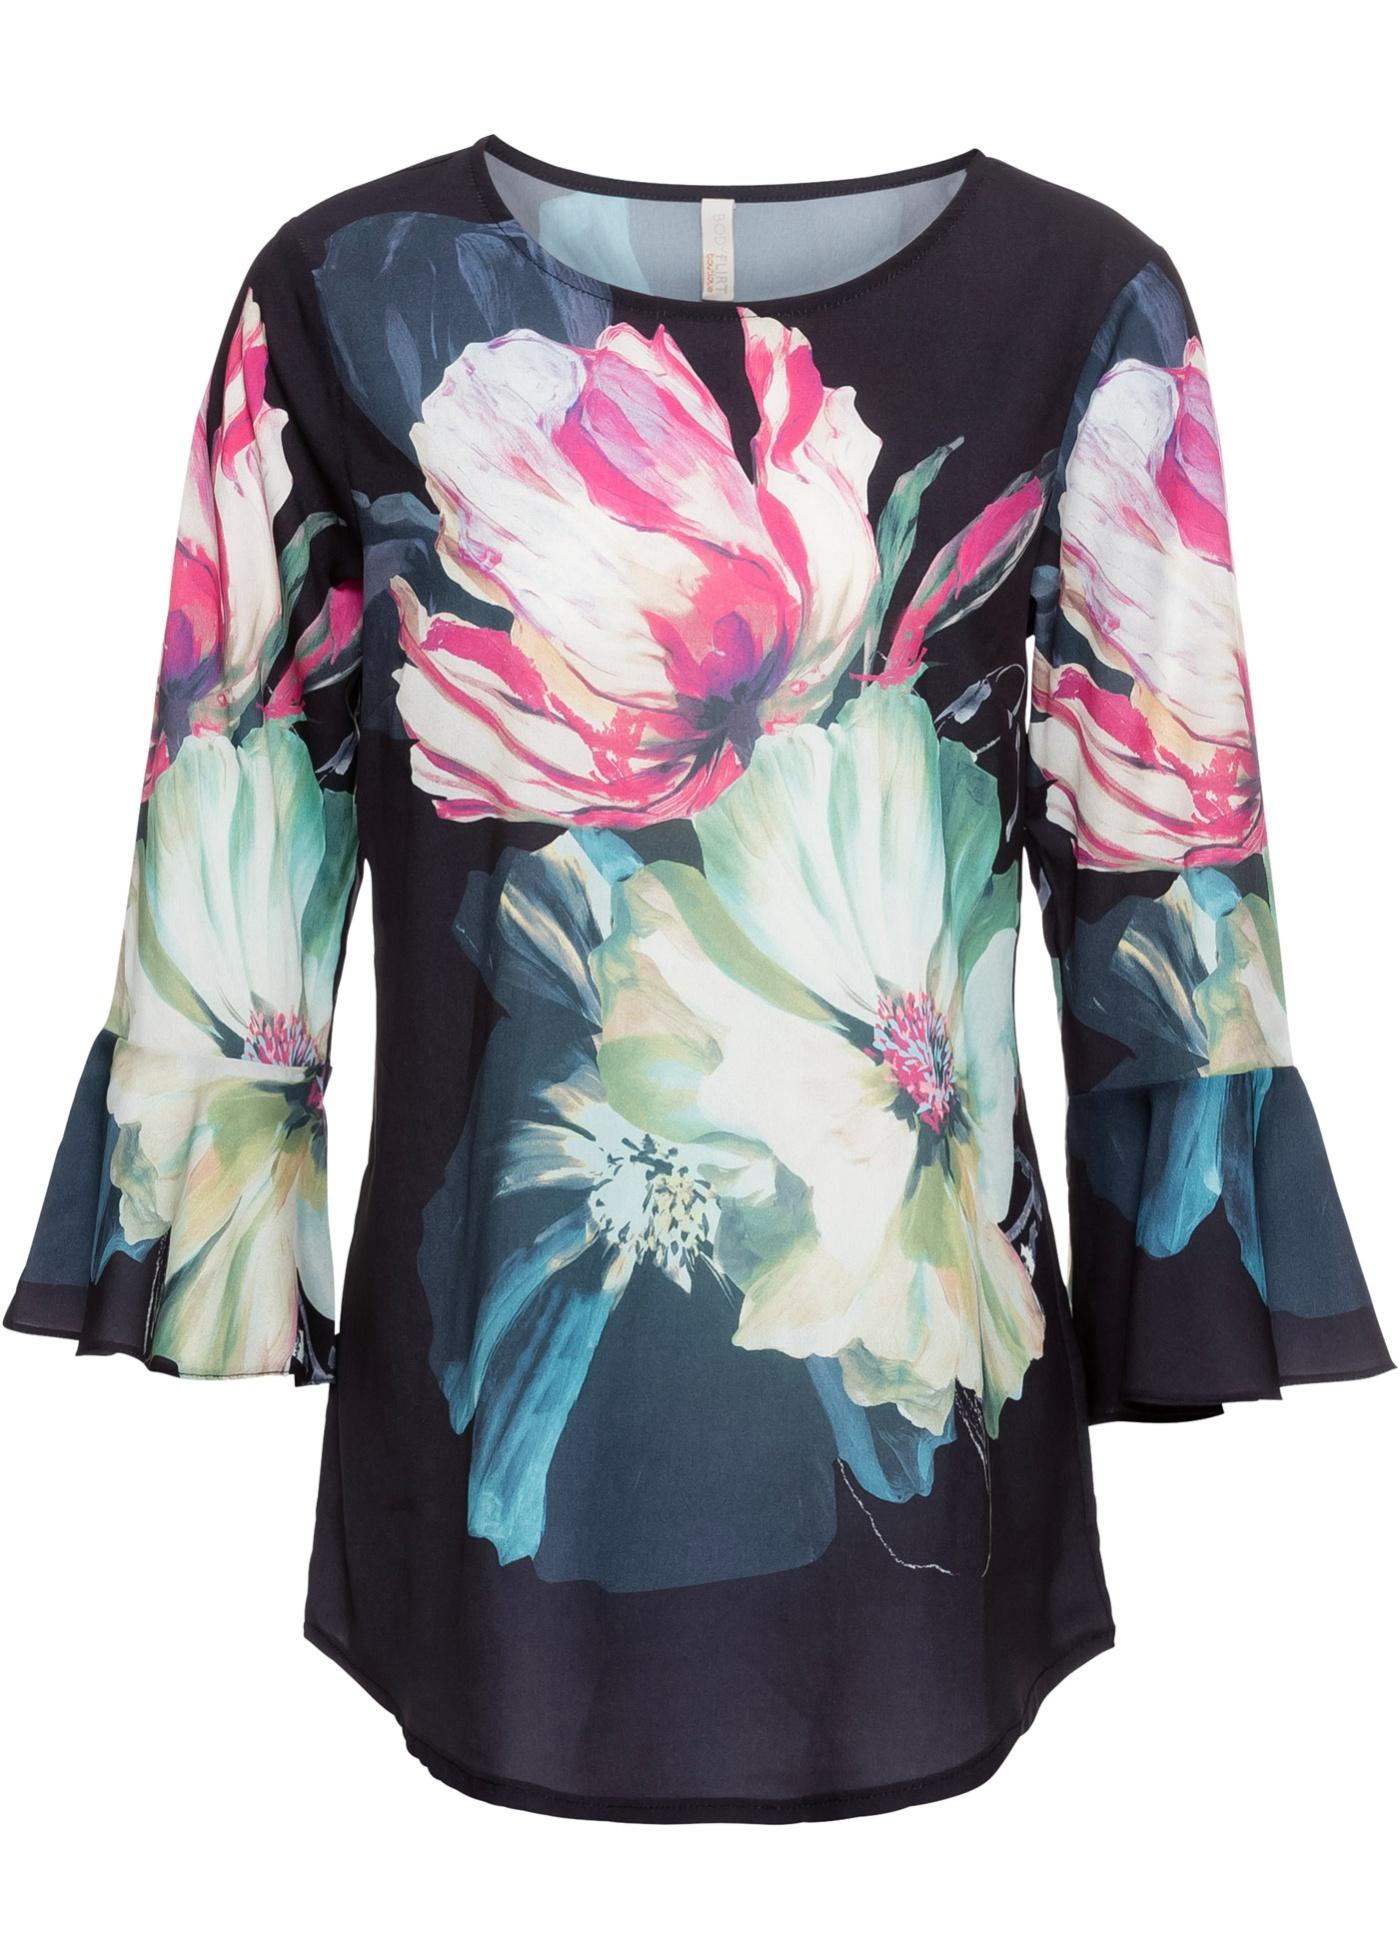 Blusa con stampa floreale (Blu) - BODYFLIRT boutique